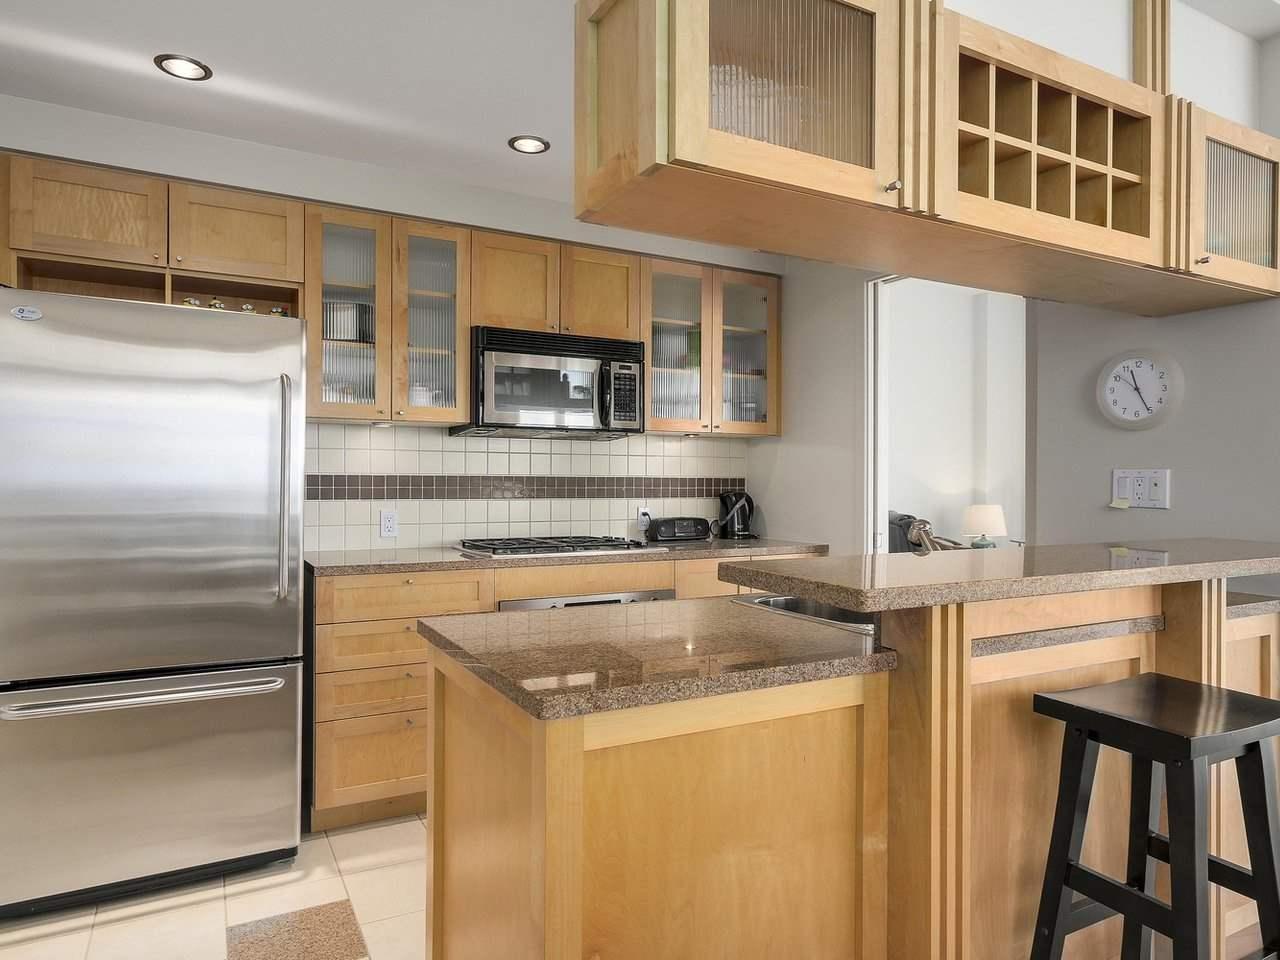 Condo Apartment at 1106 1483 HOMER STREET, Unit 1106, Vancouver West, British Columbia. Image 10